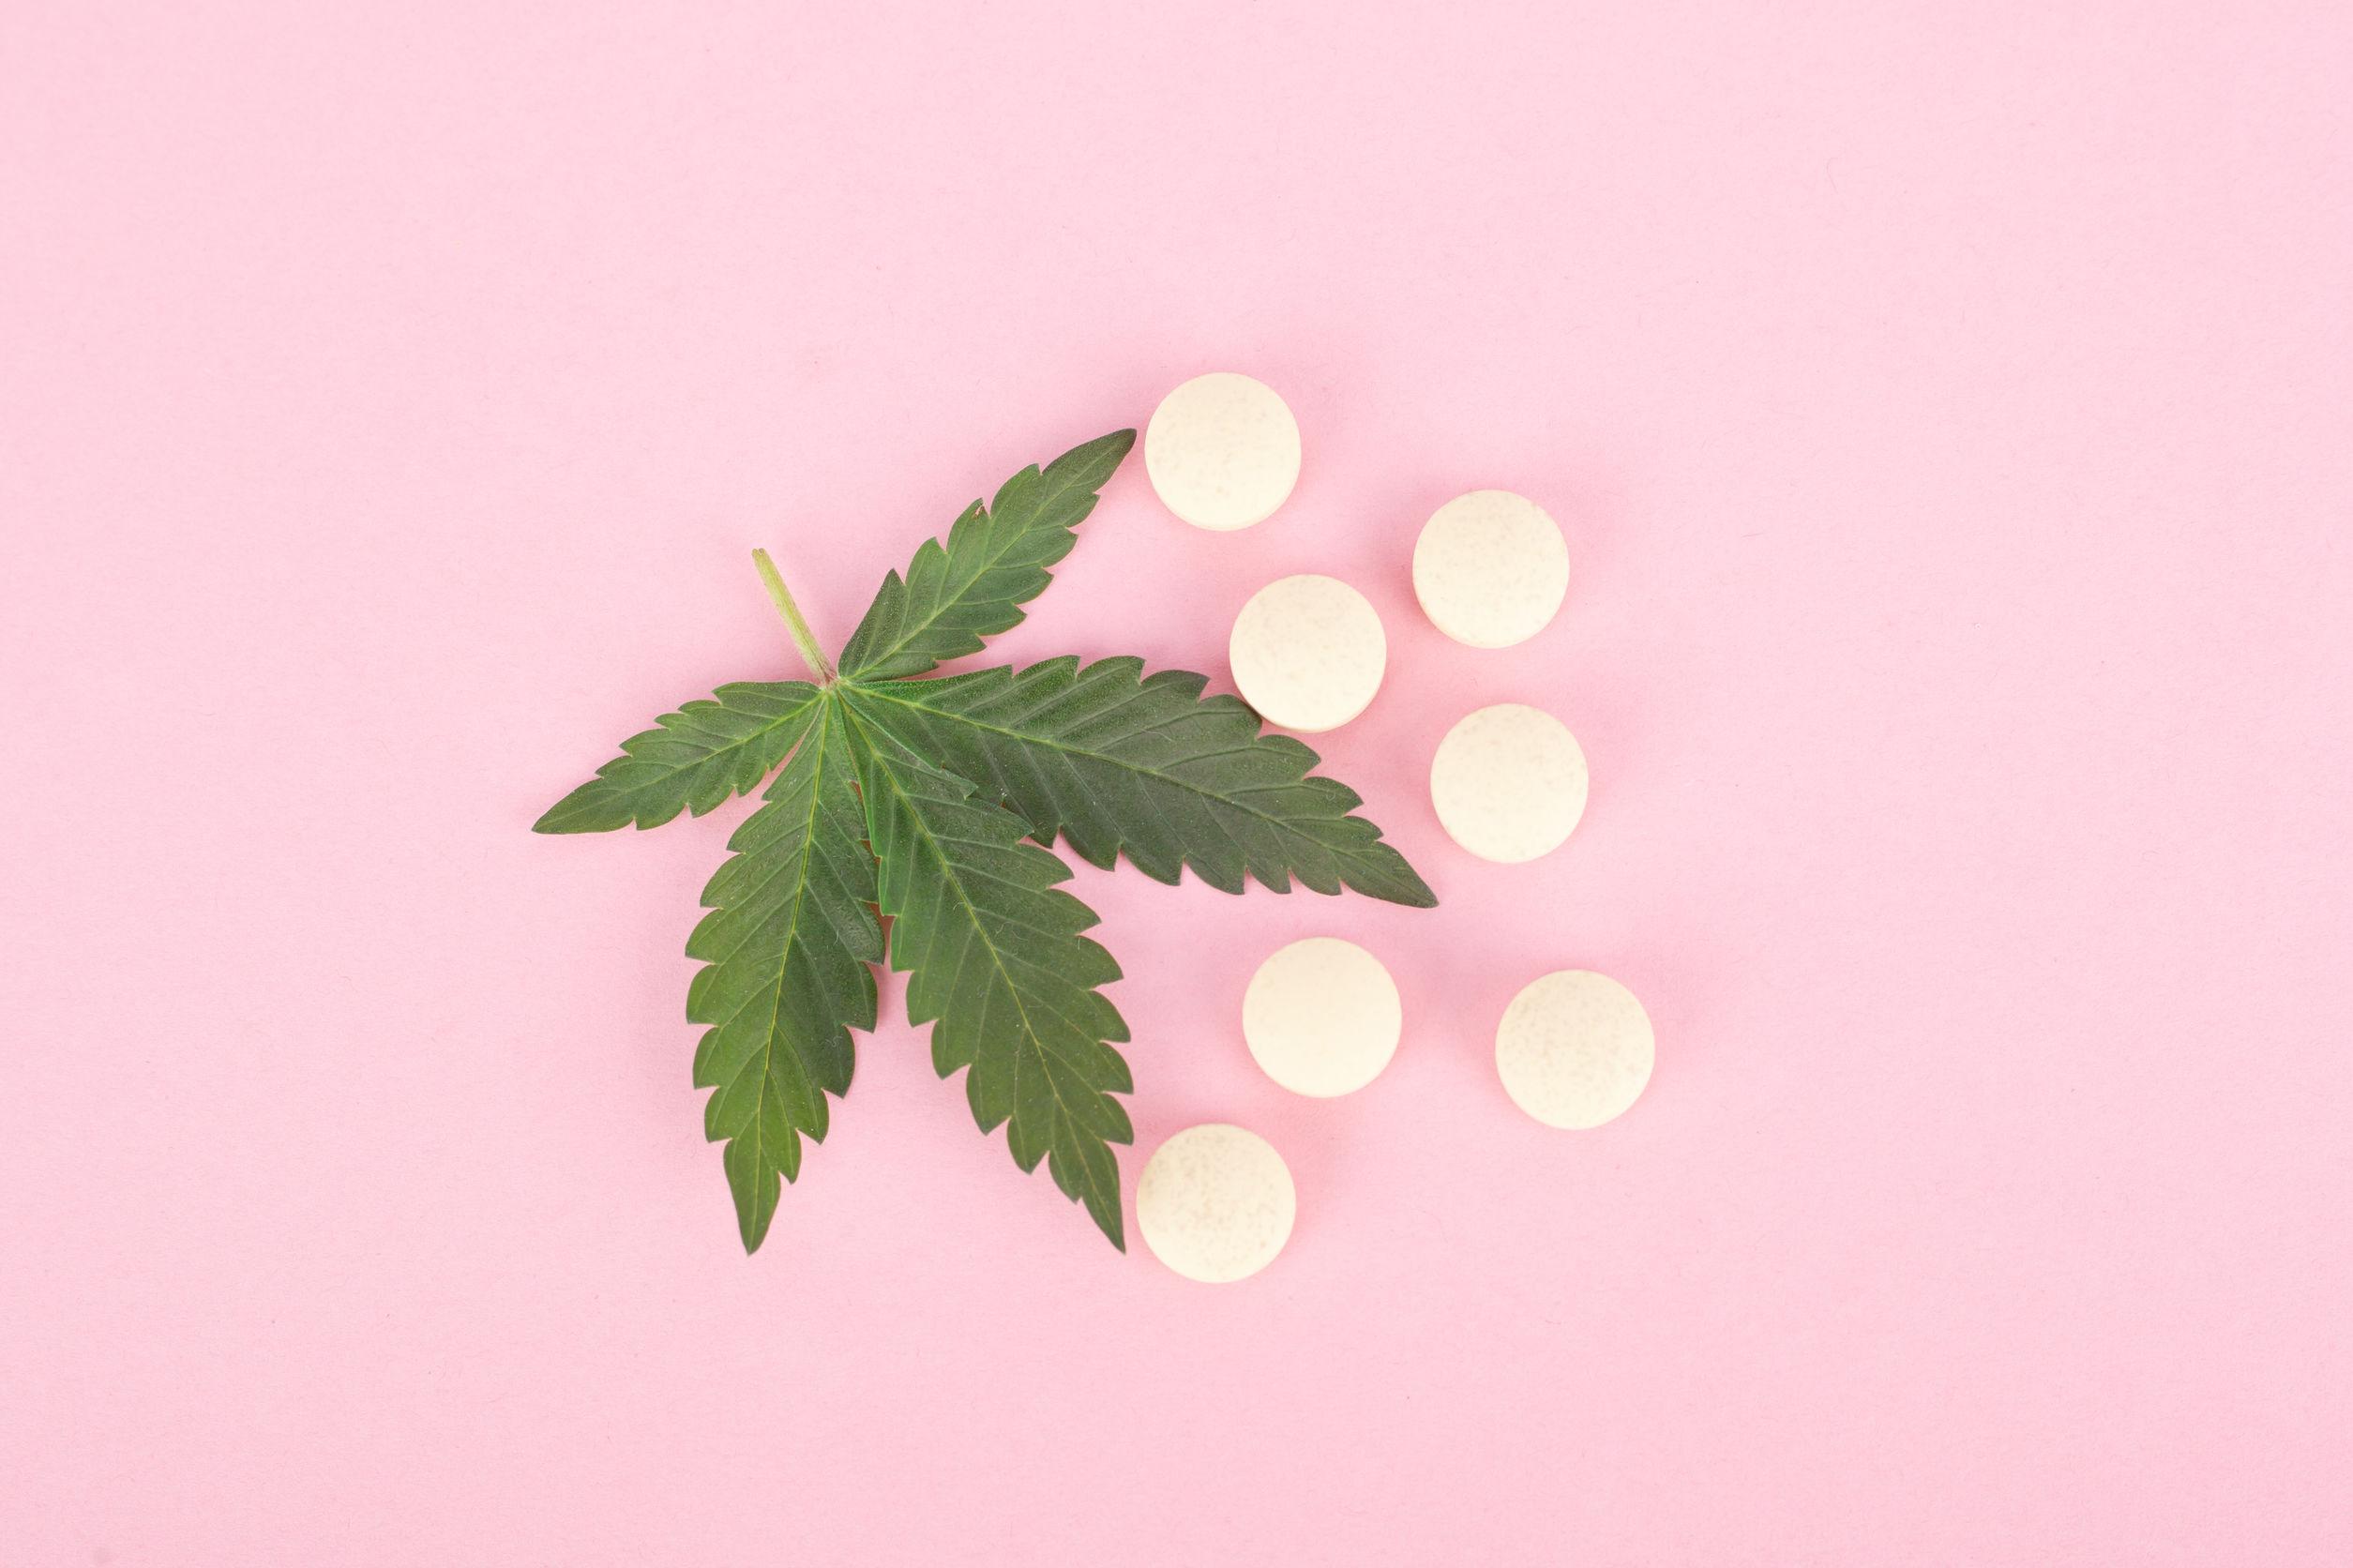 CBD Tabletten: Test, Wirkung, Anwendung & Studien (08/20)